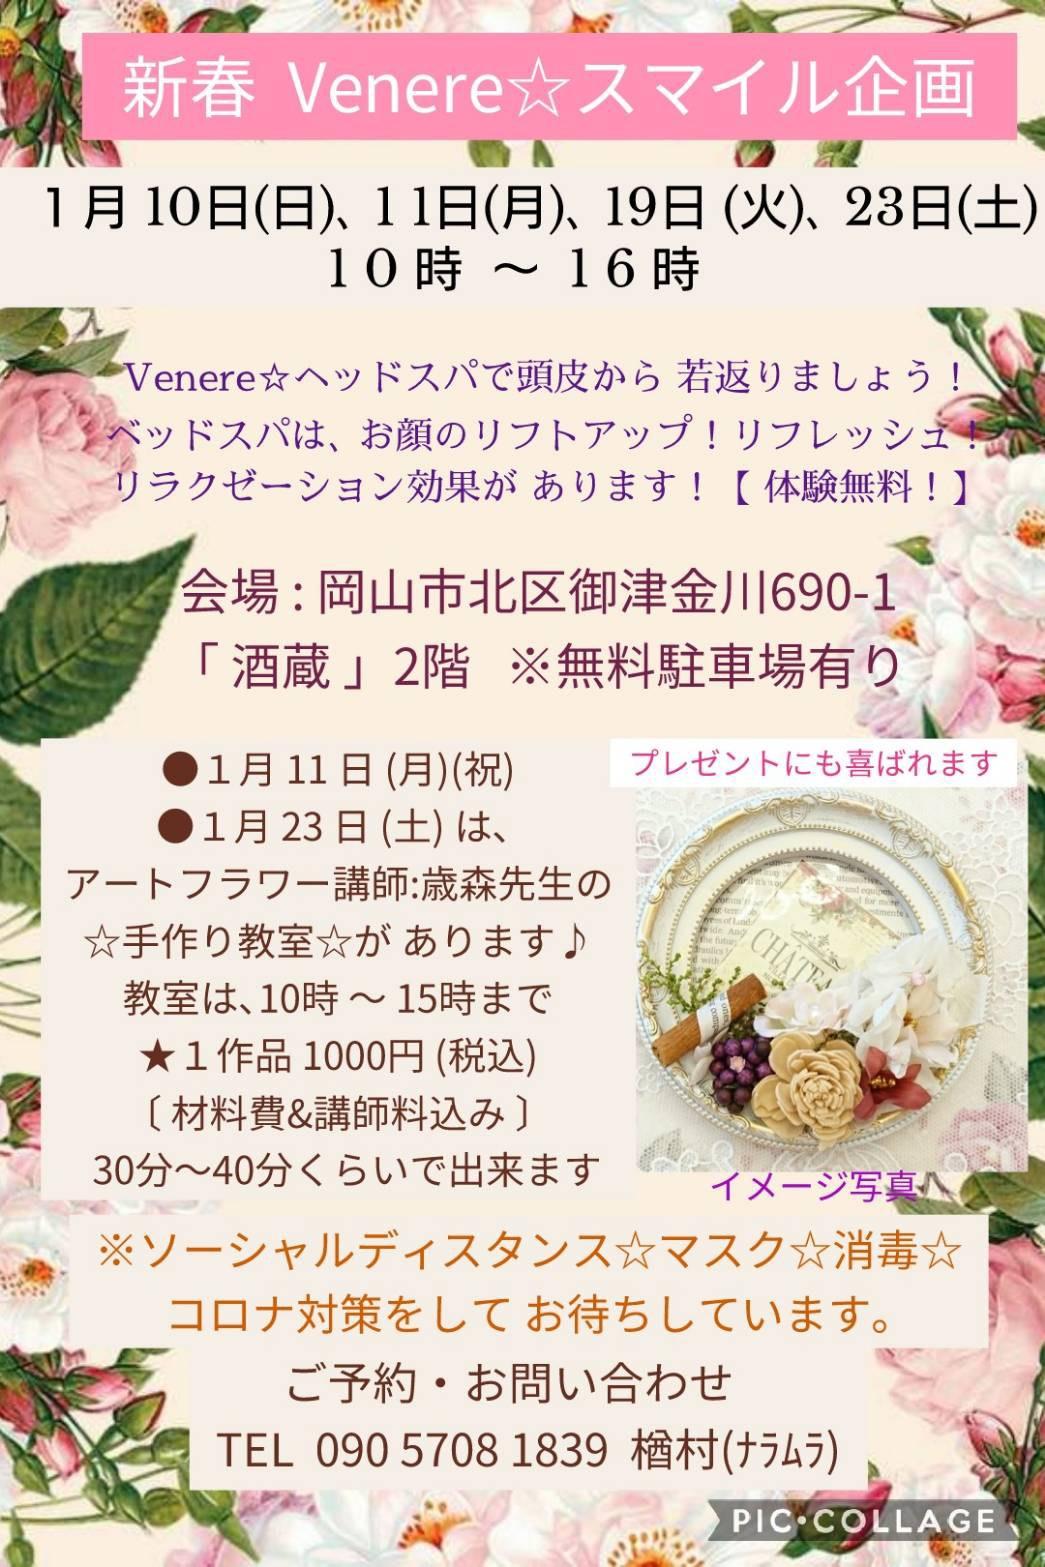 Venere☆スマイル企画